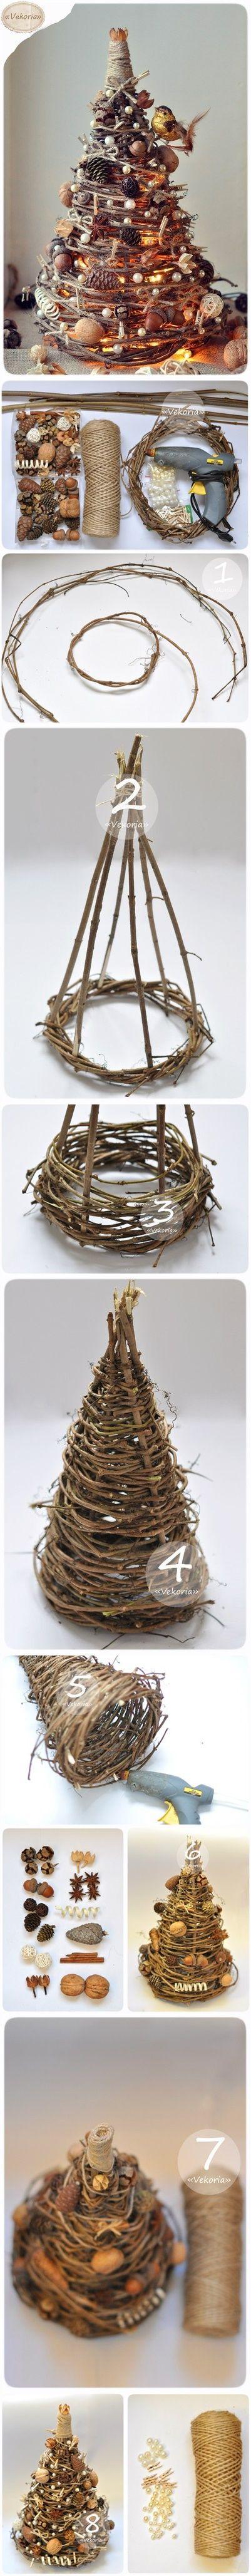 Christmas Tree: